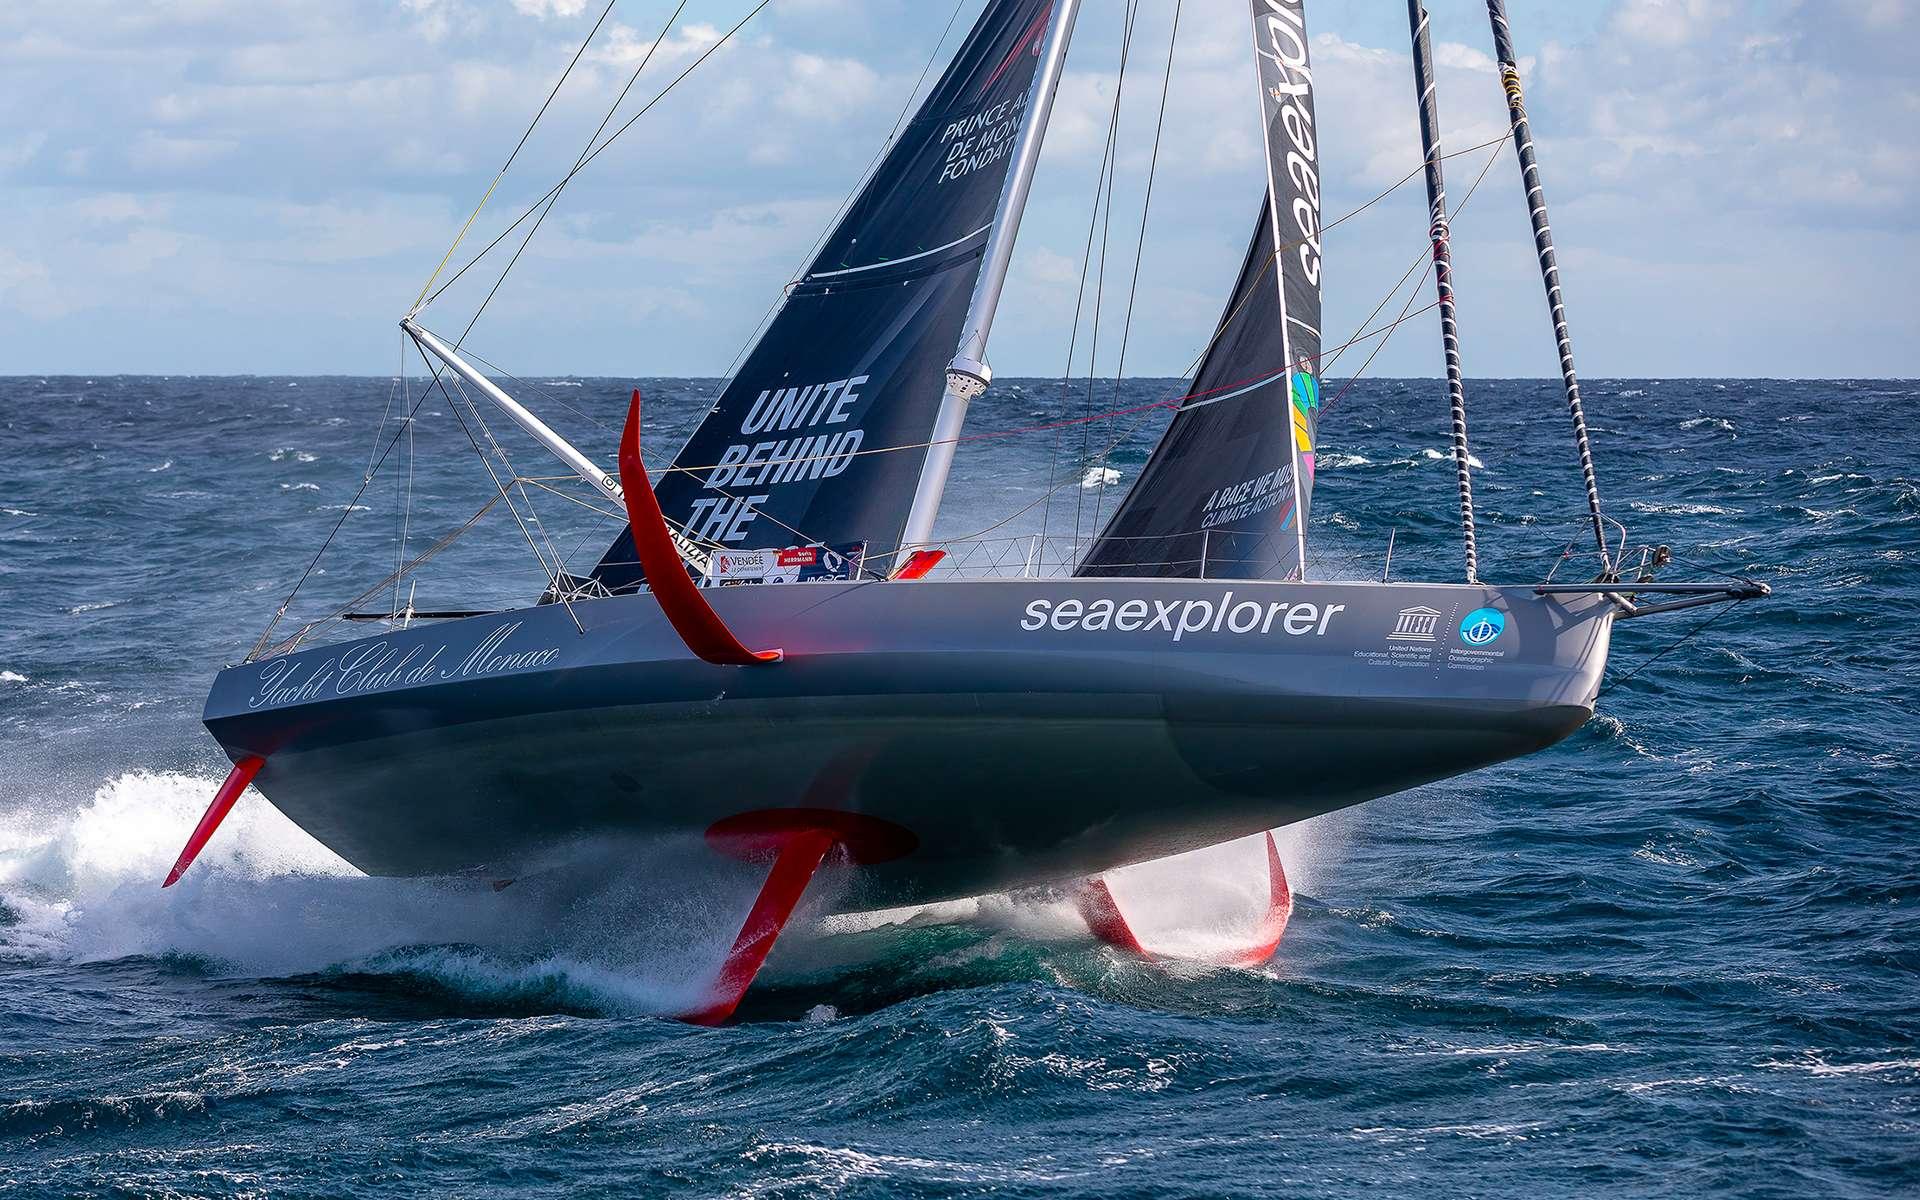 Le monocoque Imoca de Boris Herman Sponsorisé par Seaexplorer - Yacht Club de Monaco. © Jean-Marie Liot